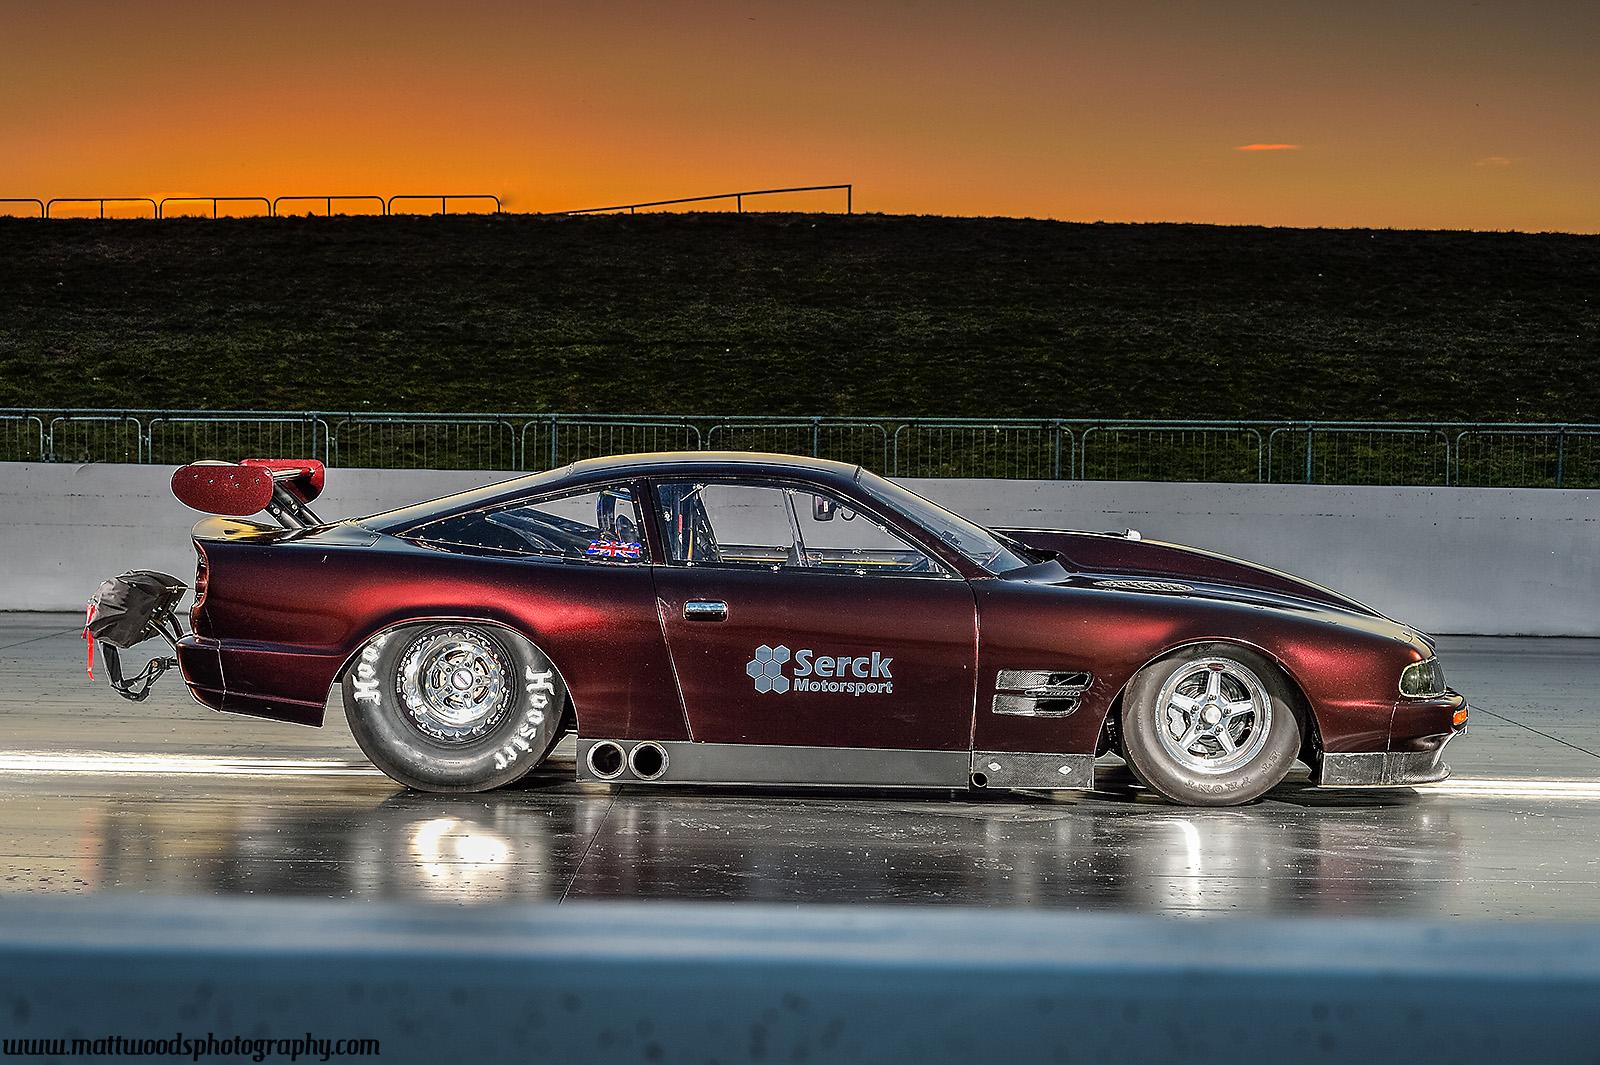 Serck Motorsport The Fastest Aston Martin In The World